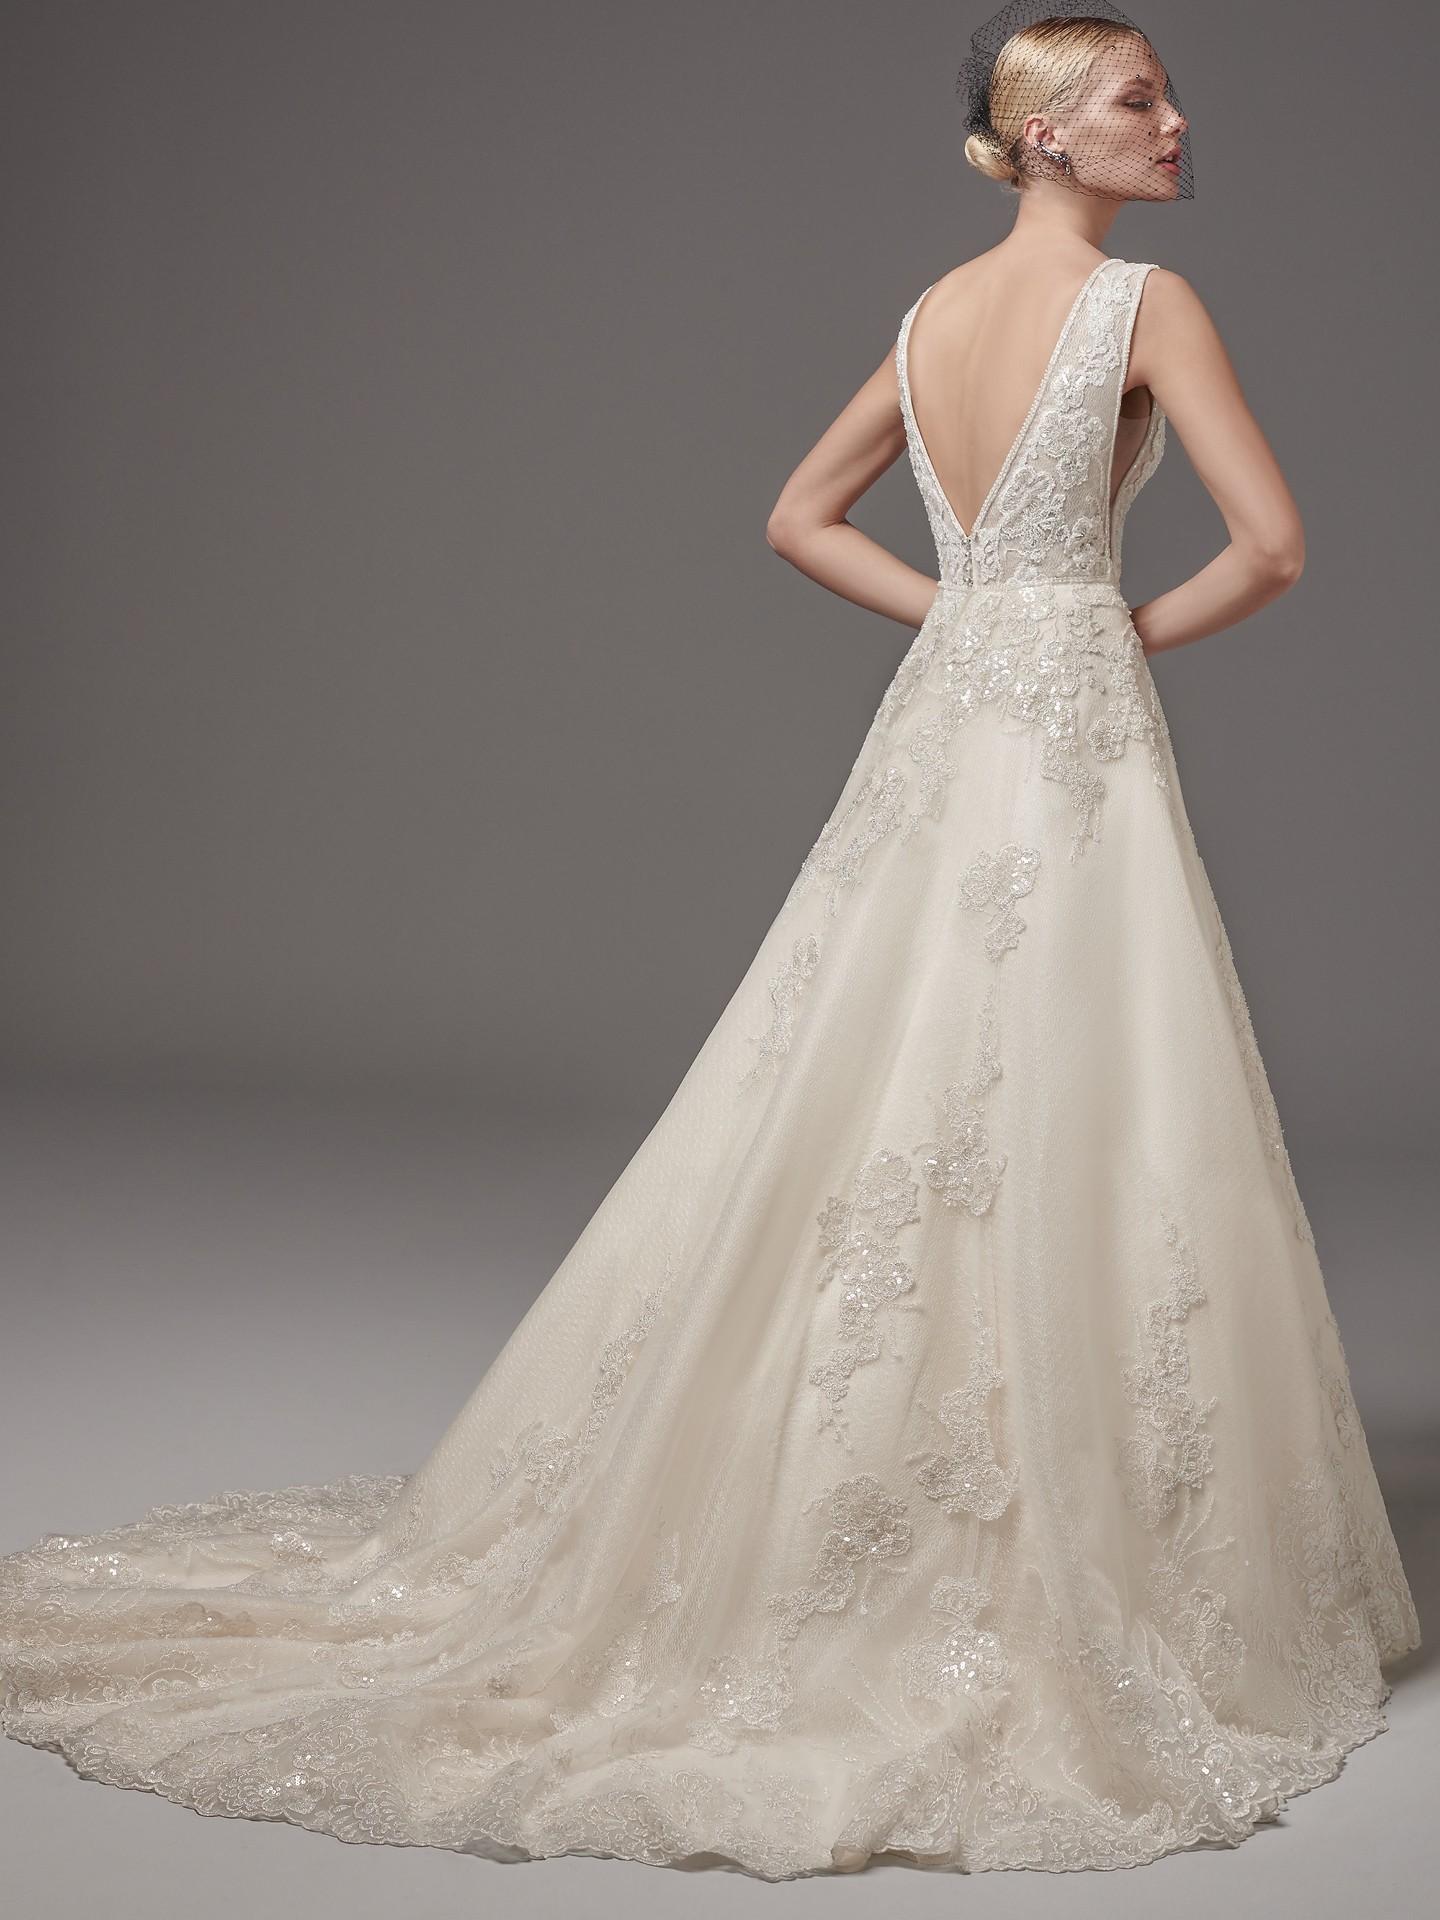 Fullsize Of Colorful Wedding Dresses